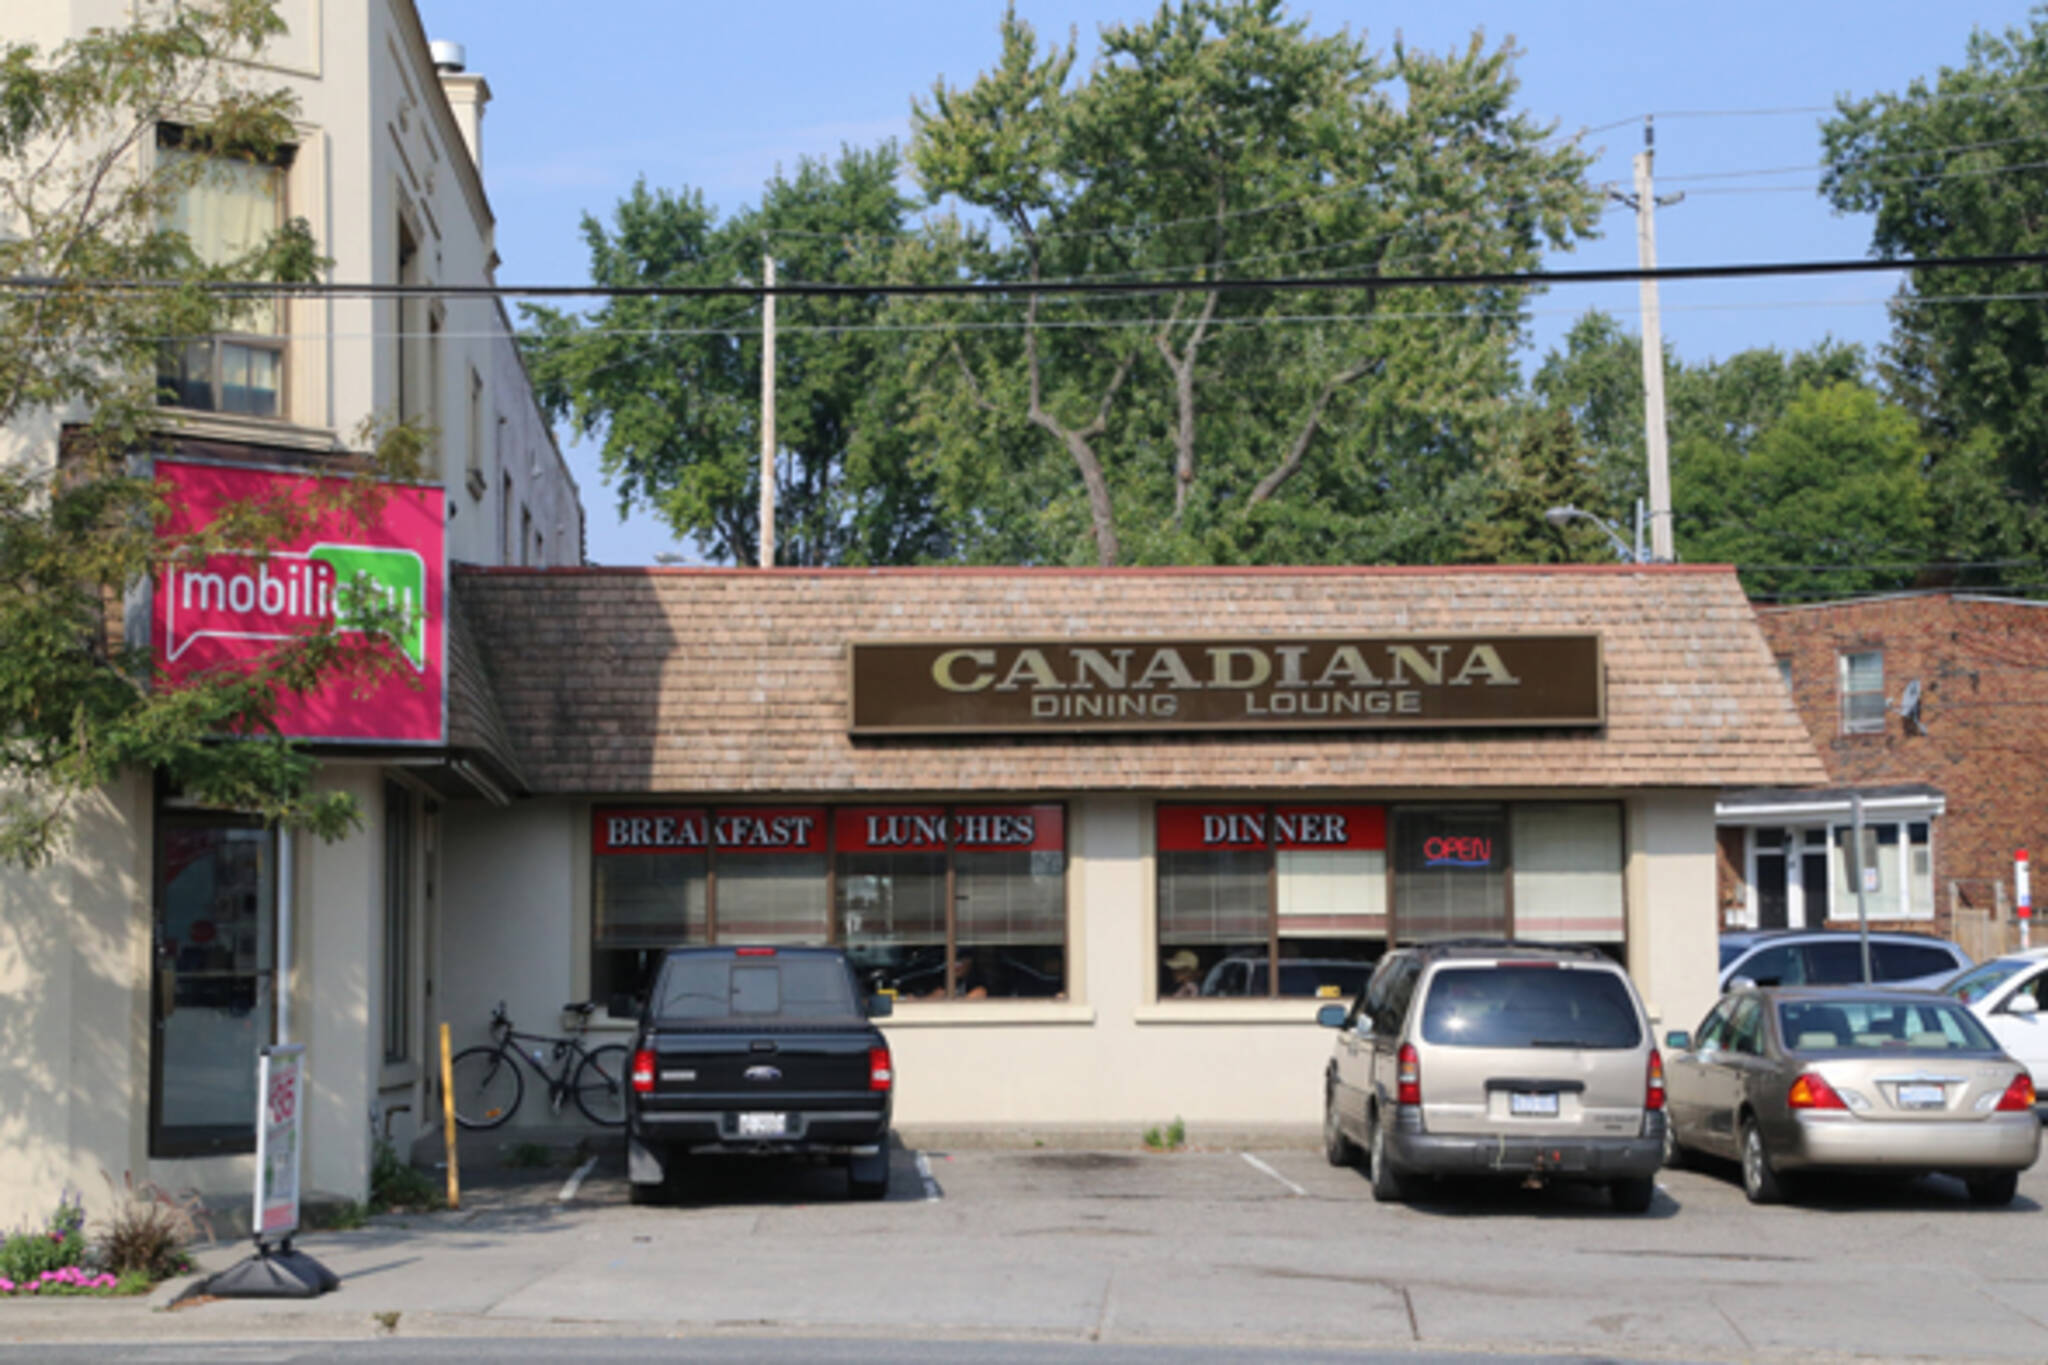 Canadiana Dining Lounge